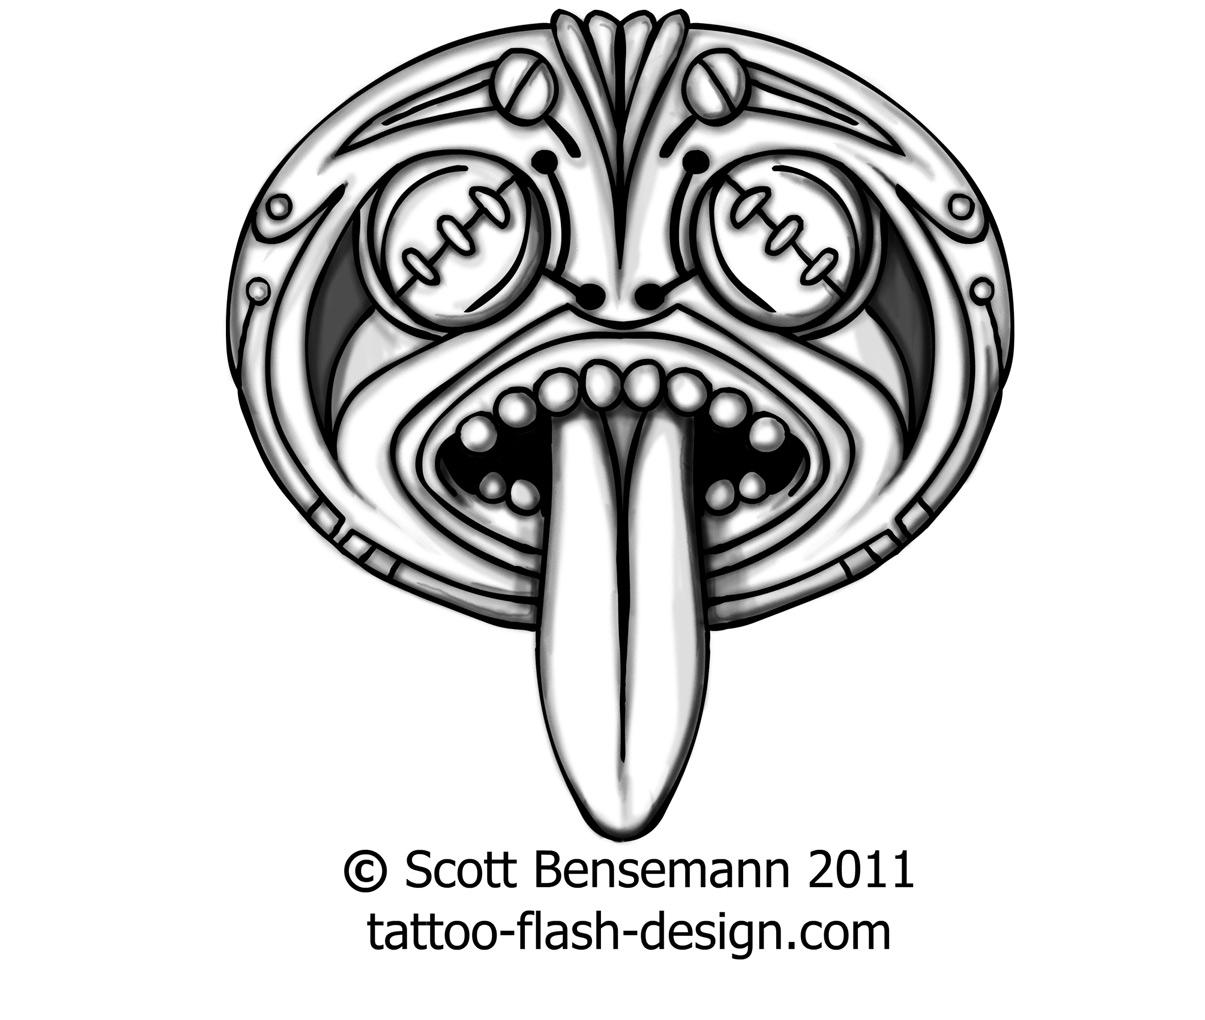 Aztec clipart face. Drawing at getdrawings com